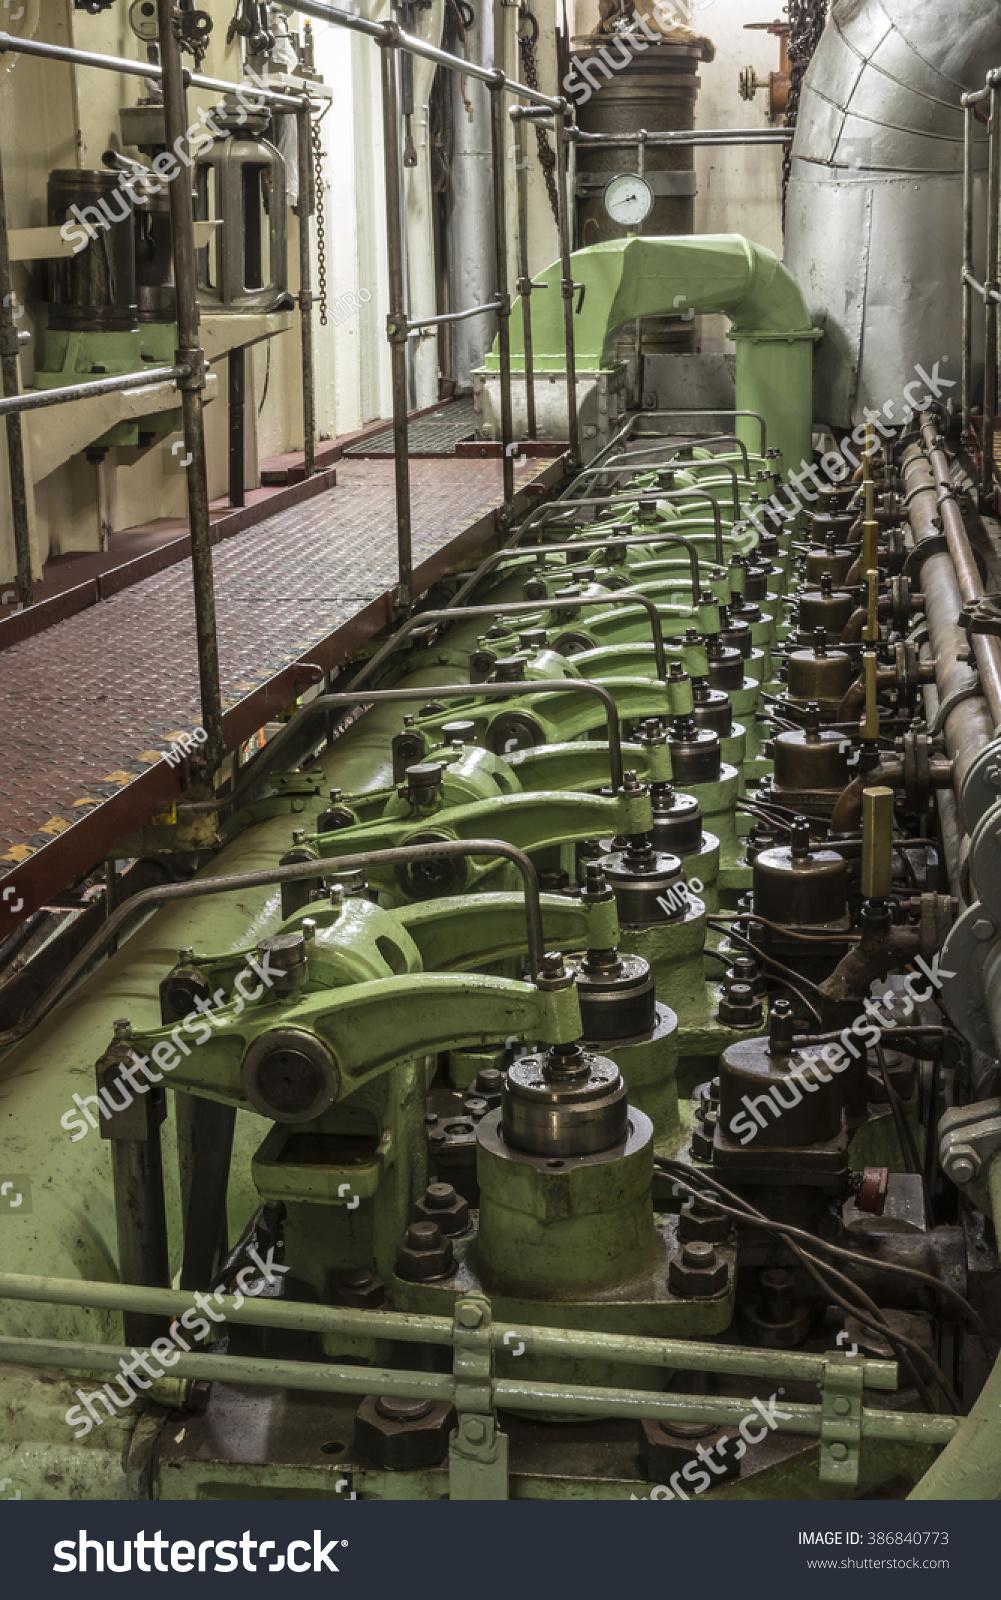 Battleship Engine Room: Ship Engine Room Stock Photo 386840773 : Shutterstock